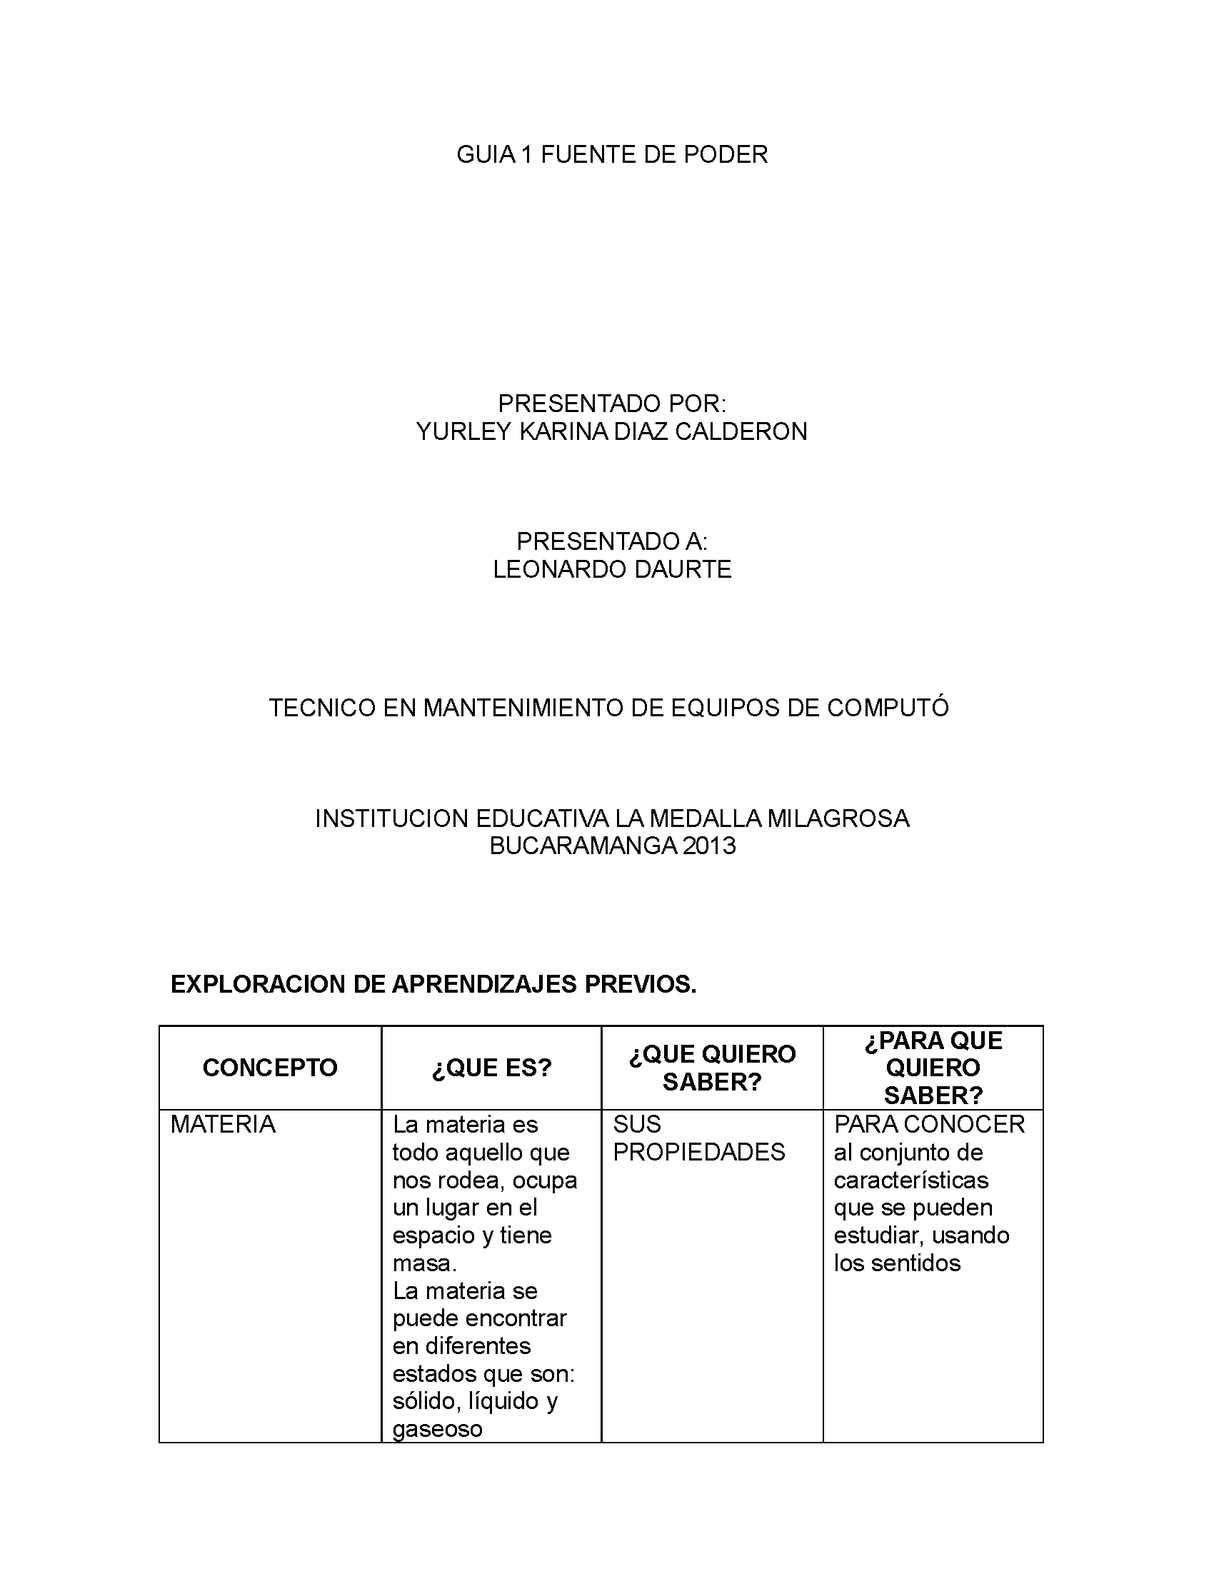 Calaméo - GUIA 1 FUENTE DE PODER bcde33f0d5db